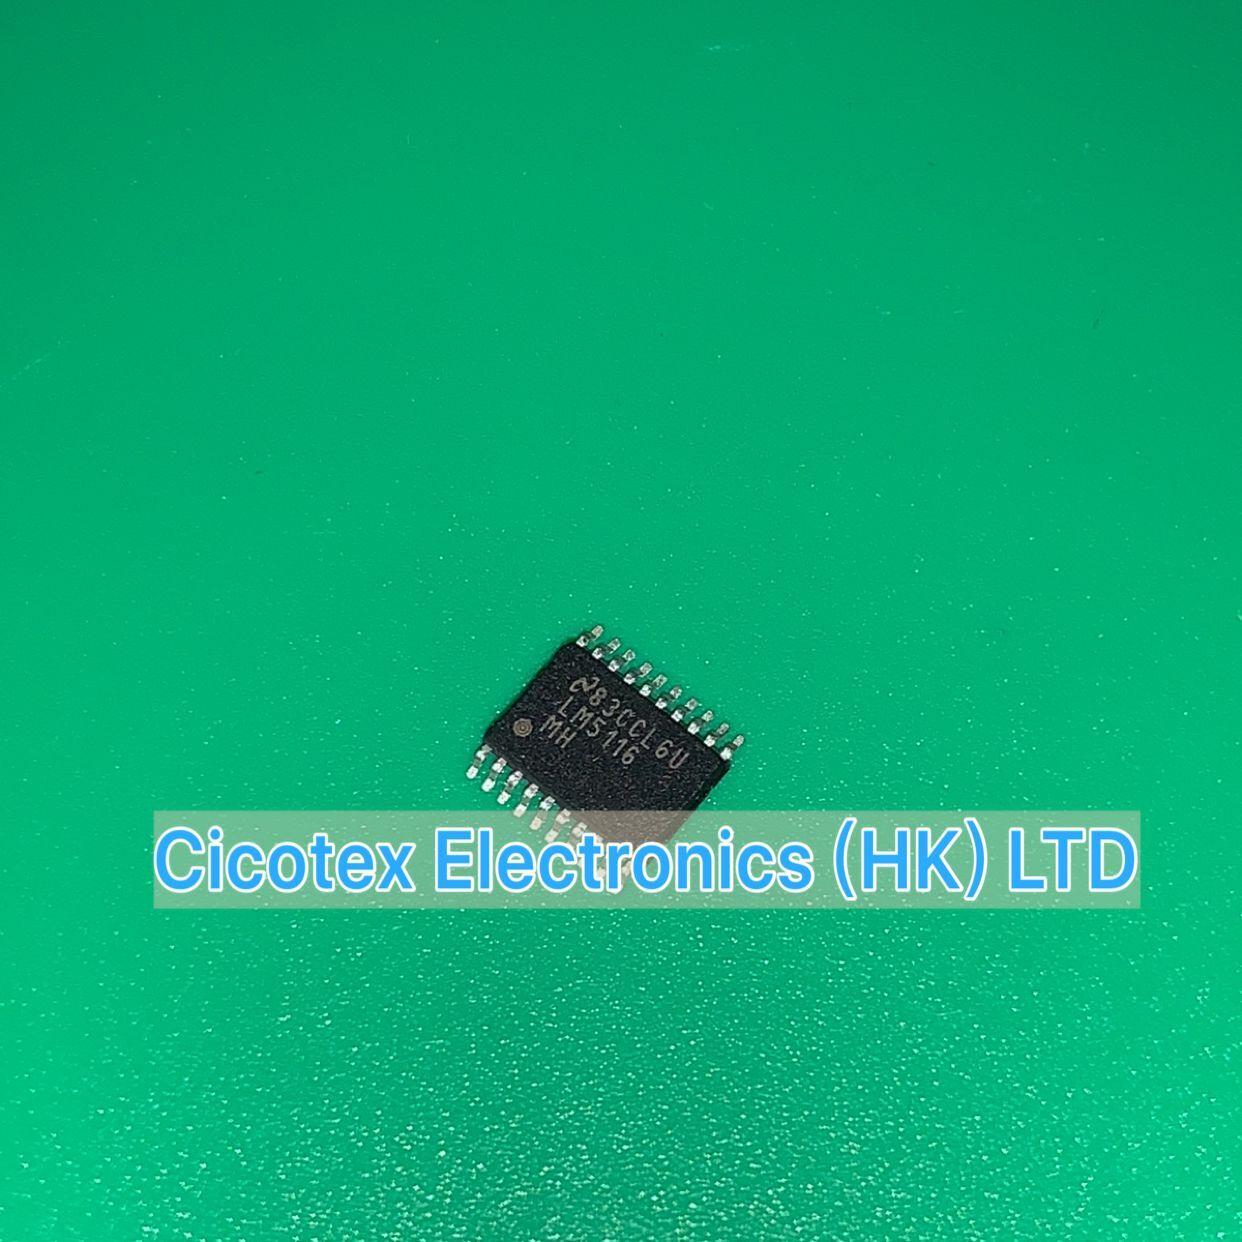 3 pçs/lote LM5116MHX TSSOP20 LM 5116MHX IC REG CTRLR FANFARRÃO 20TSSOP LM5116MH LM5116 MH LM5116MHX/NOPB LM5116MH/NOPB